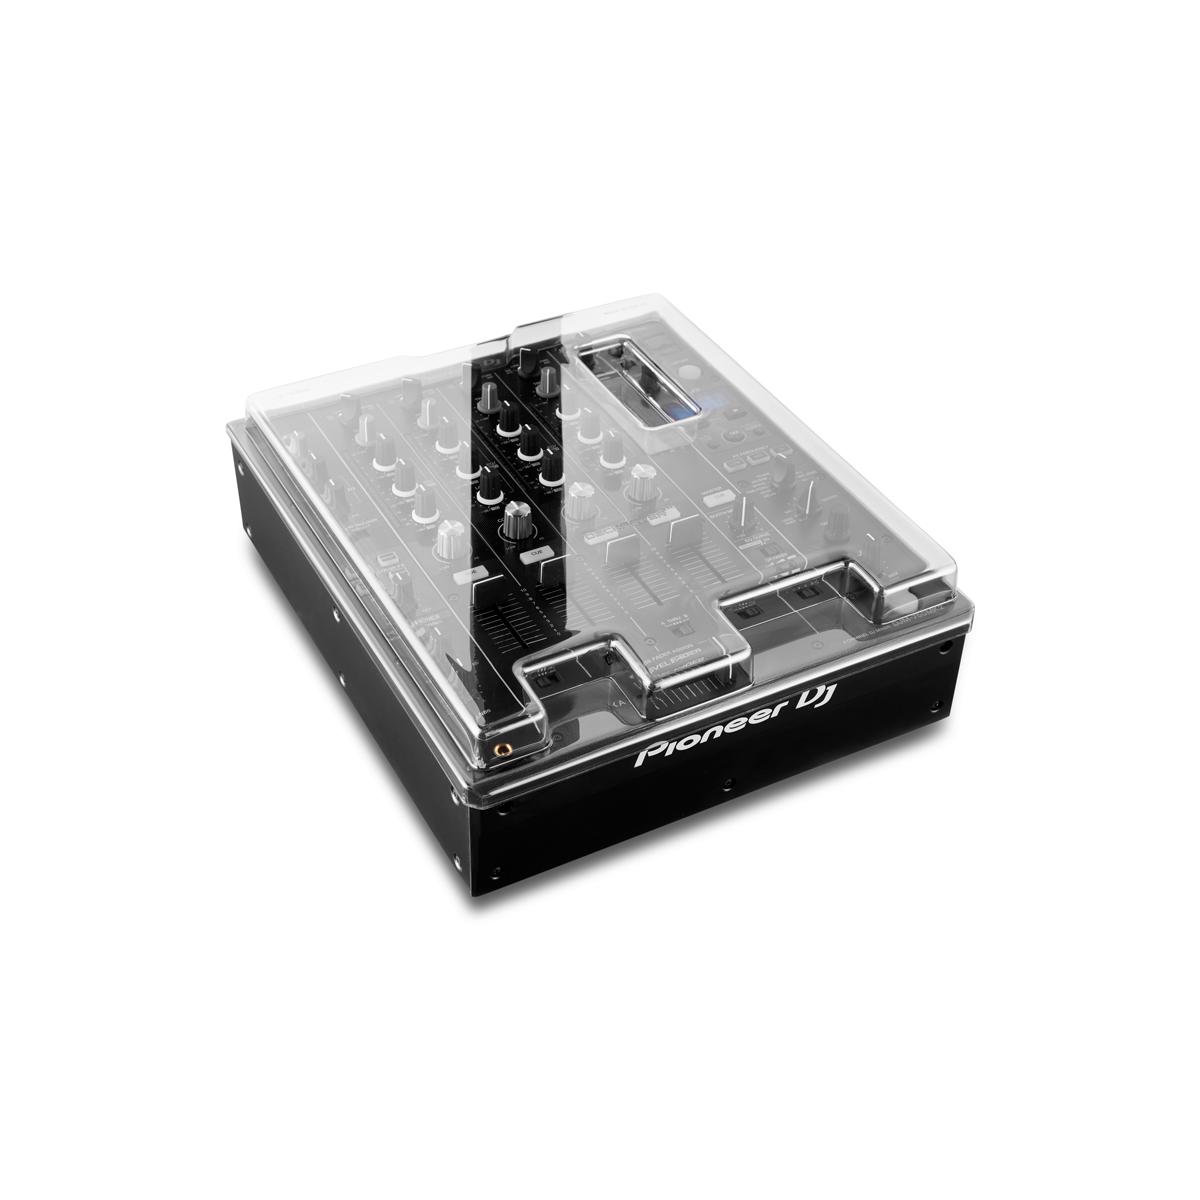 Decksavers - DeckSaver - DJM-750 MK2